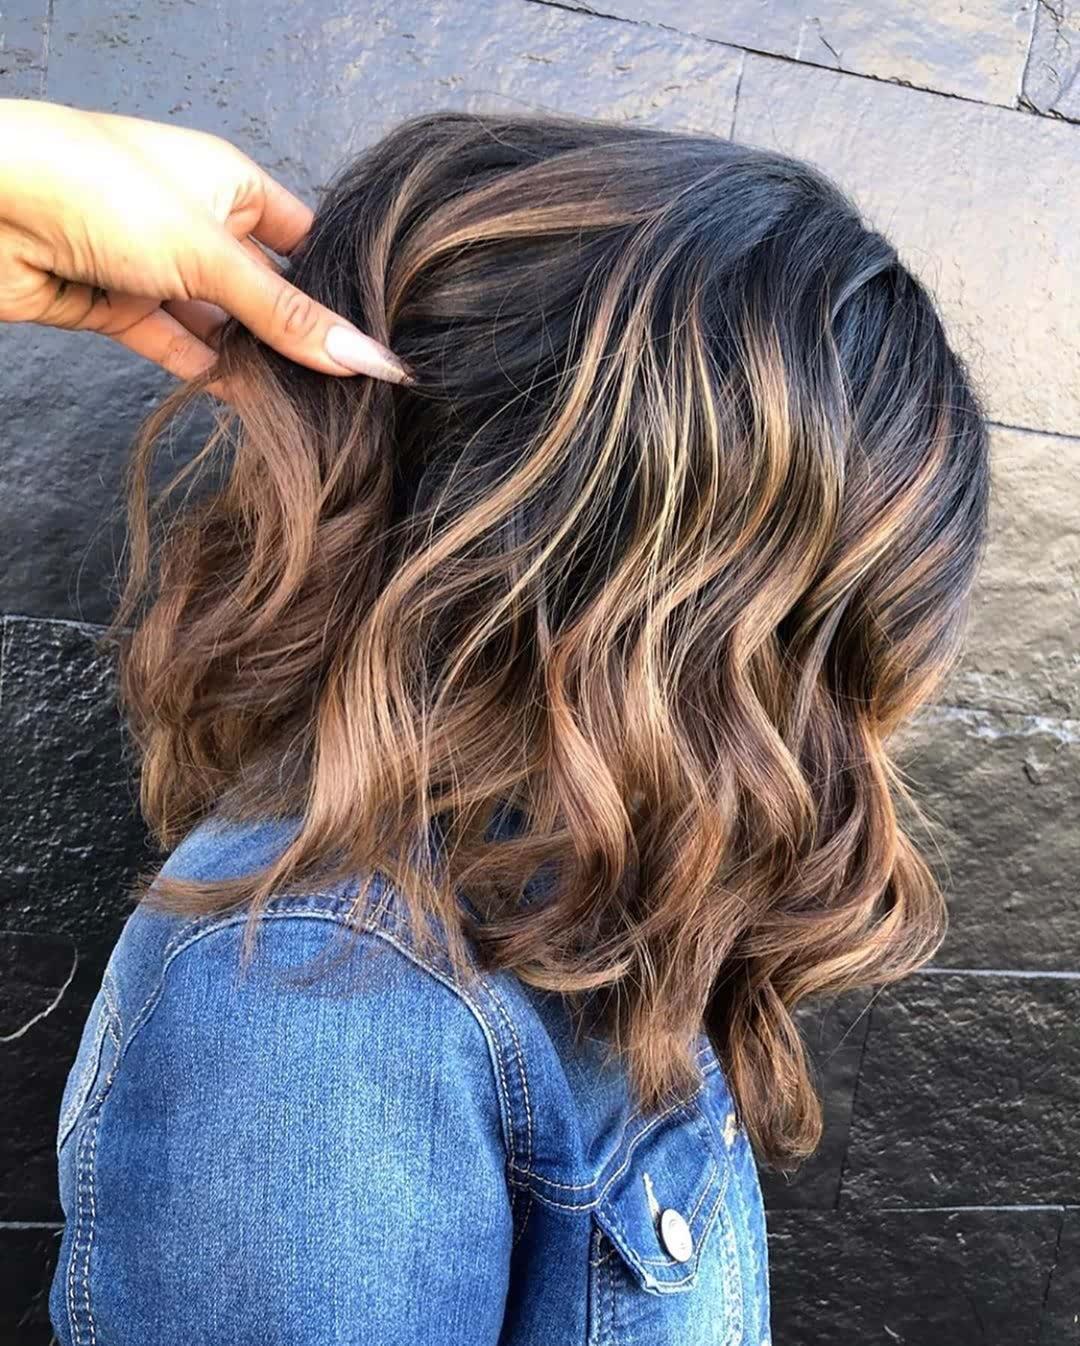 Hair Color Ideas for Bob Hairstyles (5)